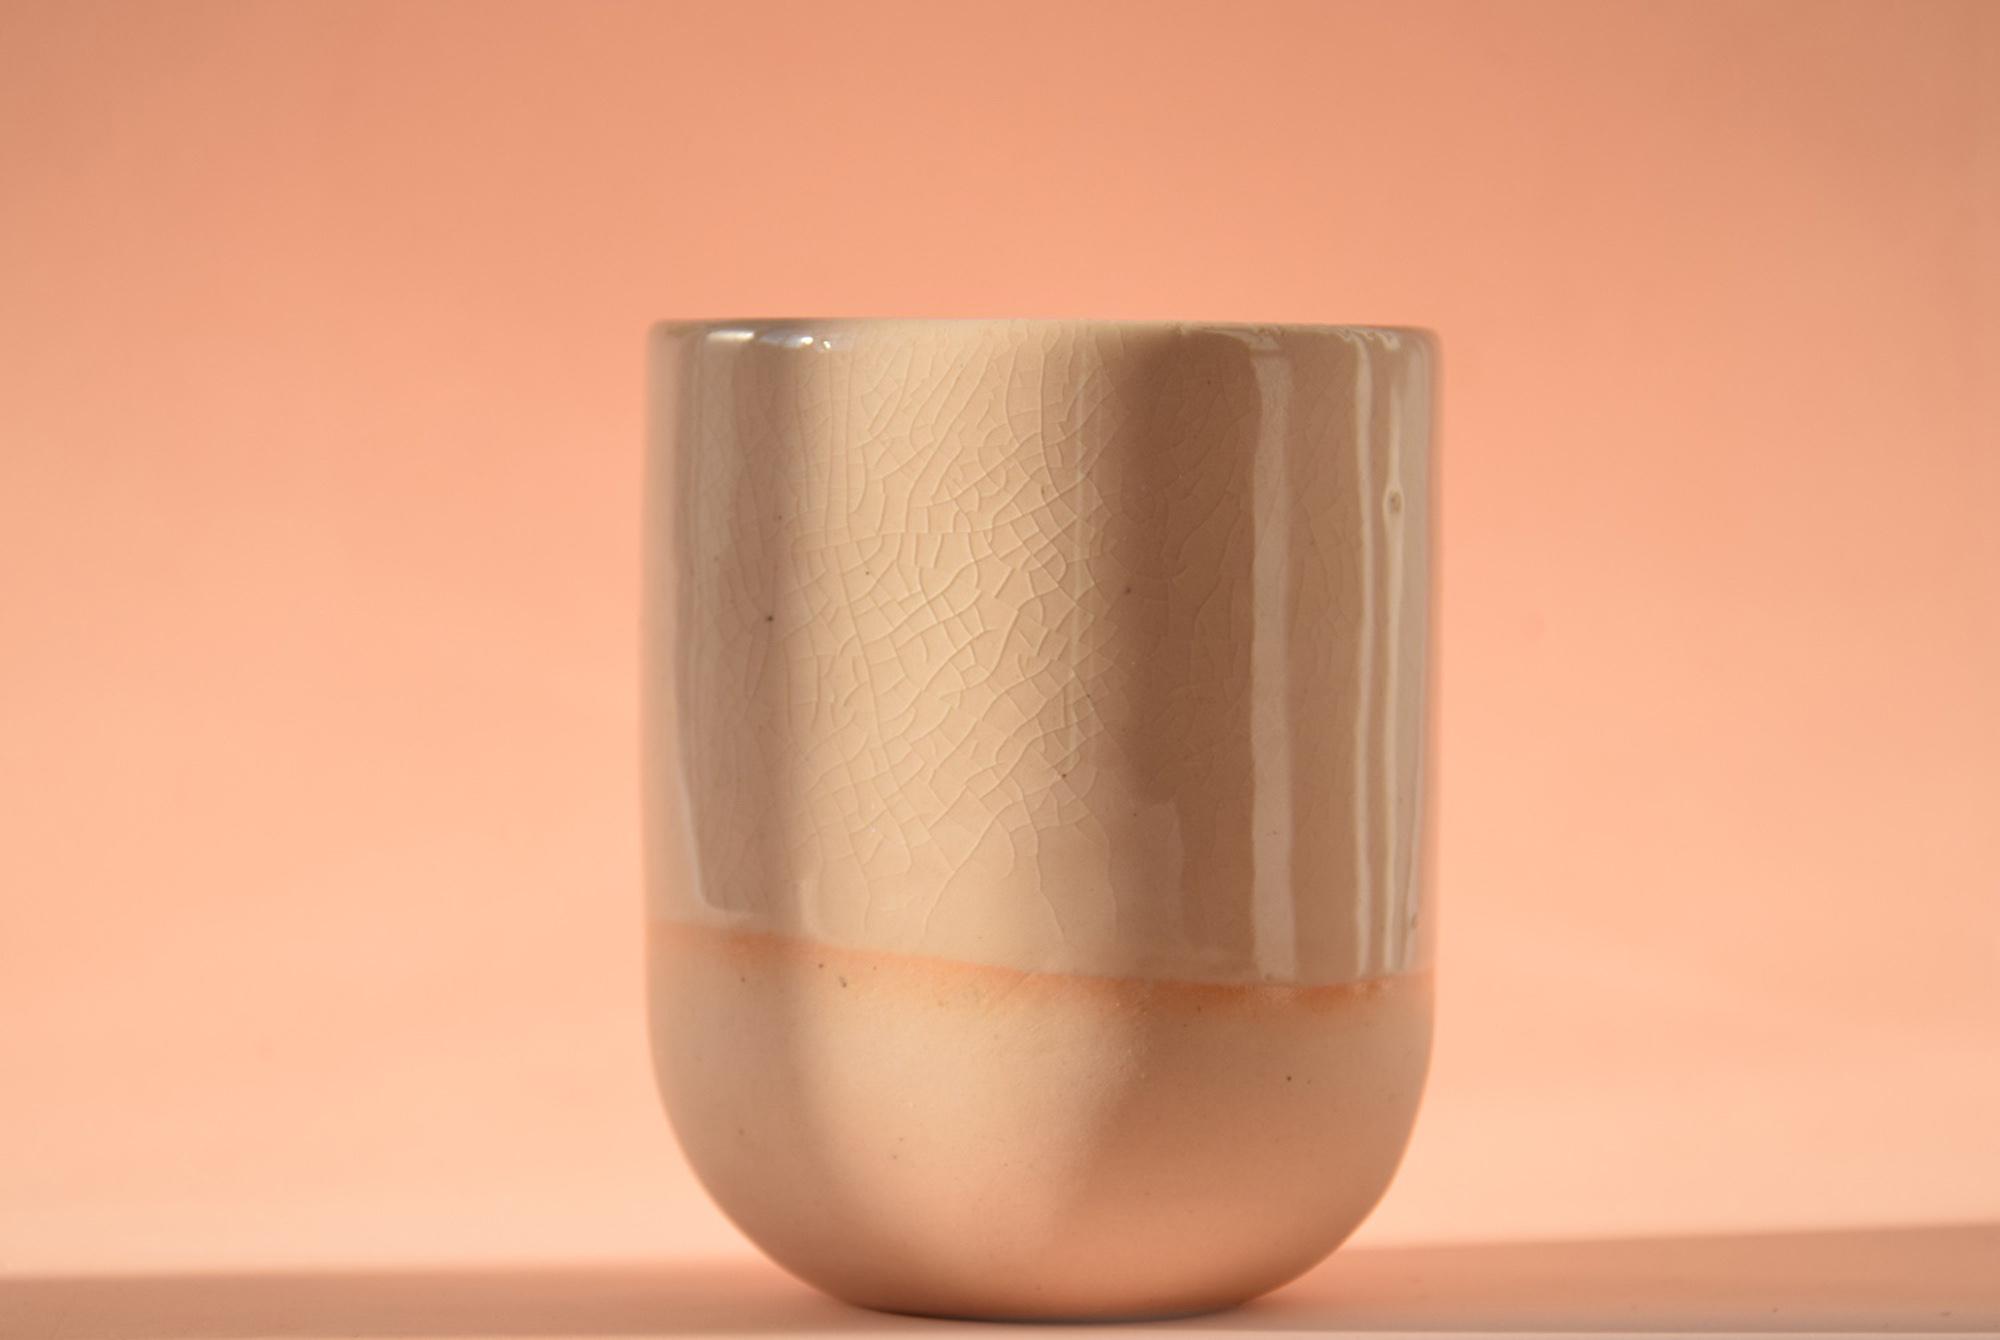 colourcup-rosecraquelee-studiokryszewski.jpg